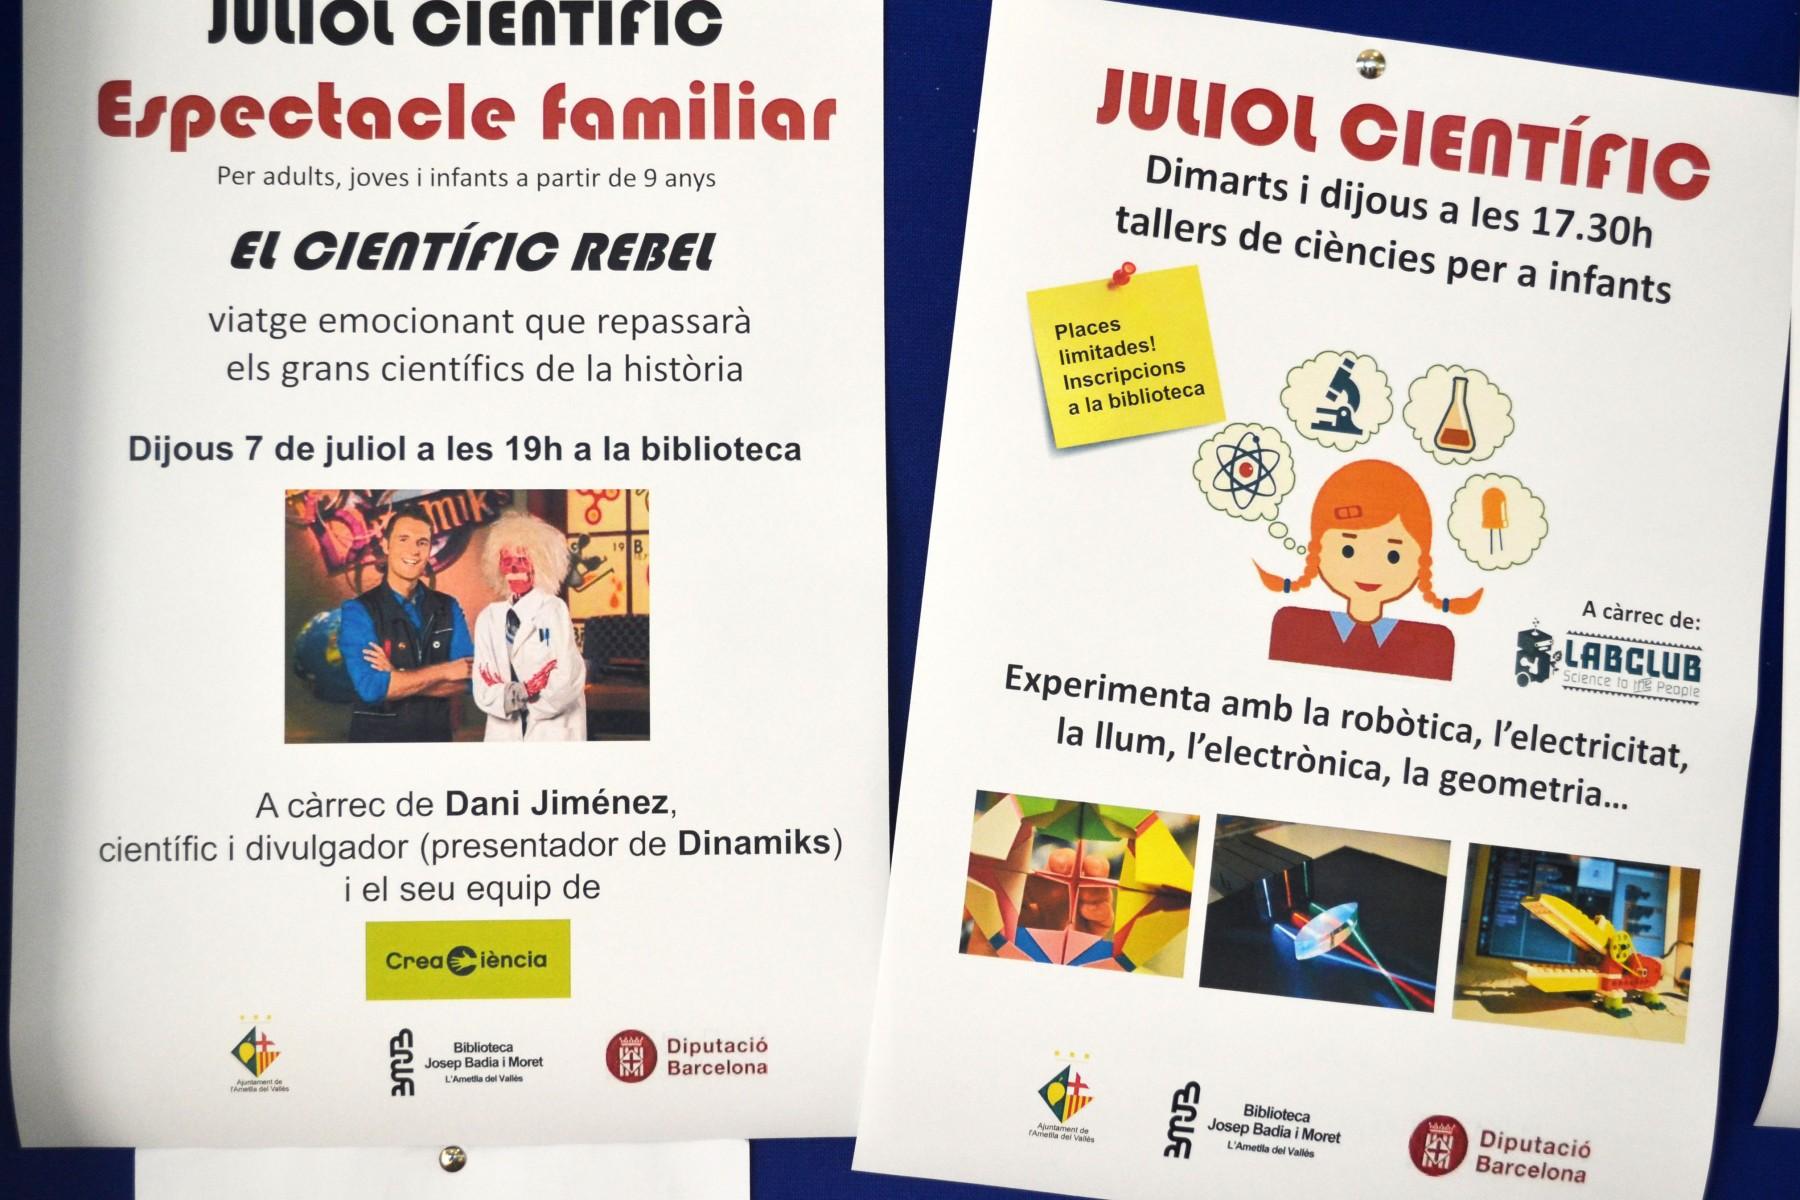 Juliol Científic LABCLUB Biblioteca Ametlla Vallès